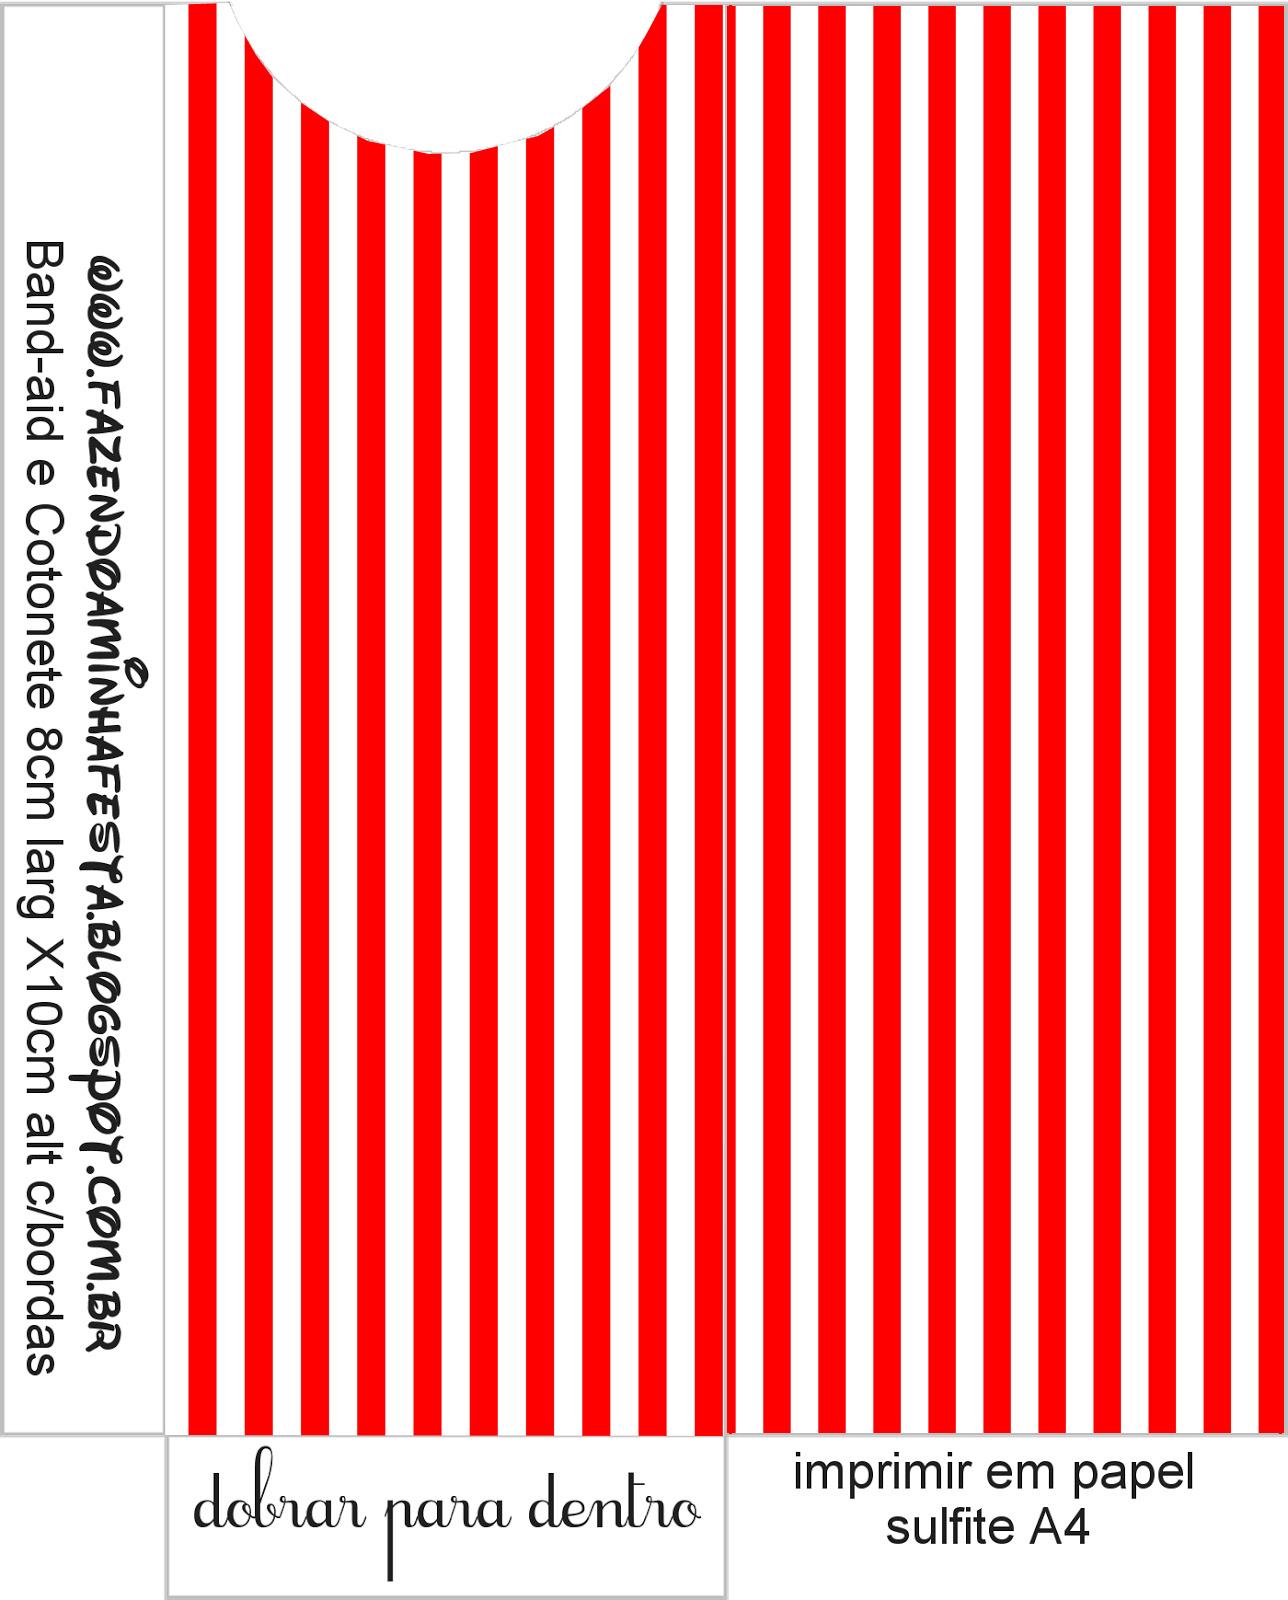 Kit Toilet – Banheiro Vermelho Listras! #CA0101 1288 1600